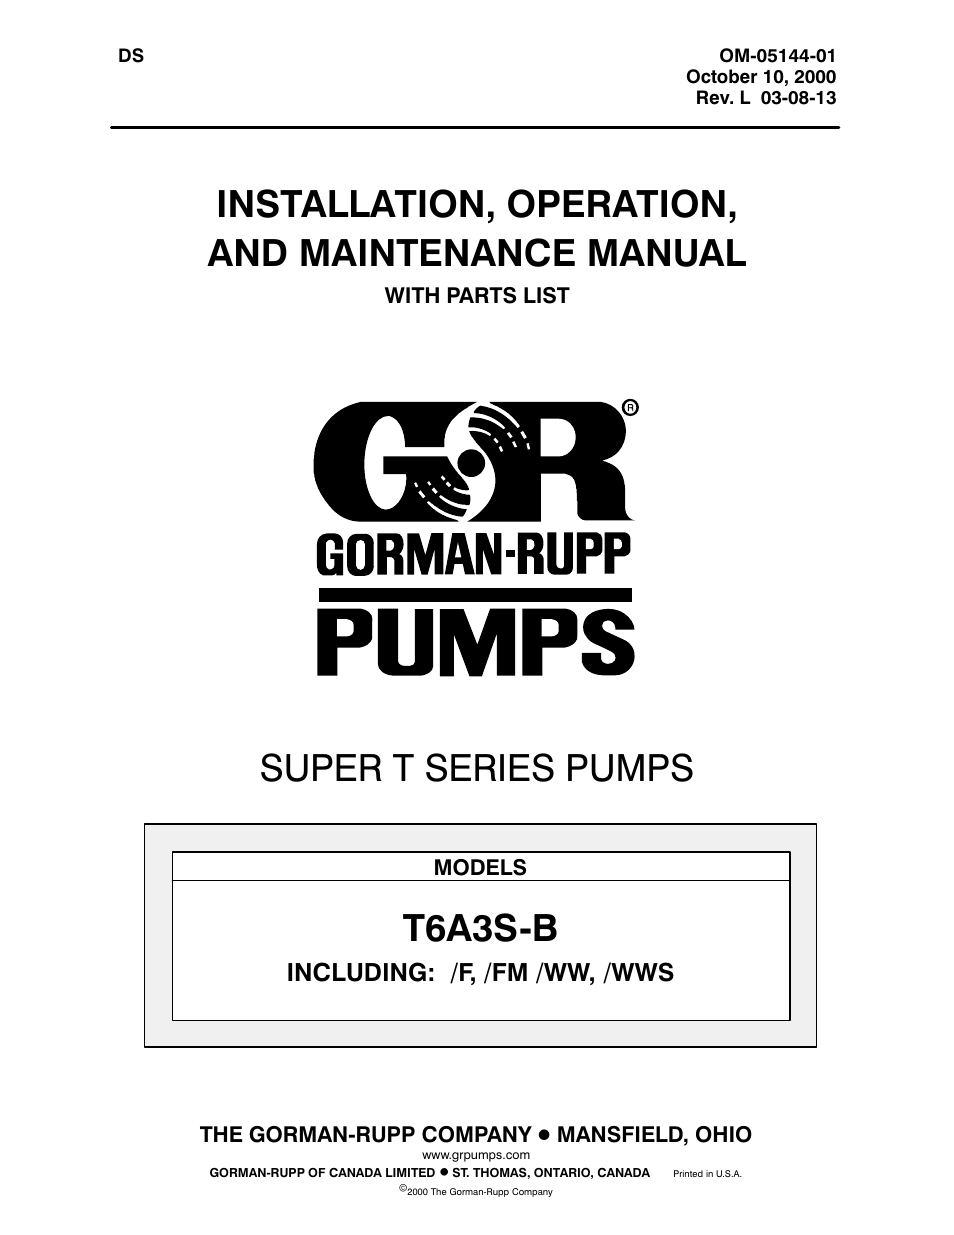 gorman rupp pumps t6a3s b f fm ww wws user manual 39 pages rh manualsdir com Gorman-Rupp T- Series Installation Gorman-Rupp Service Manual